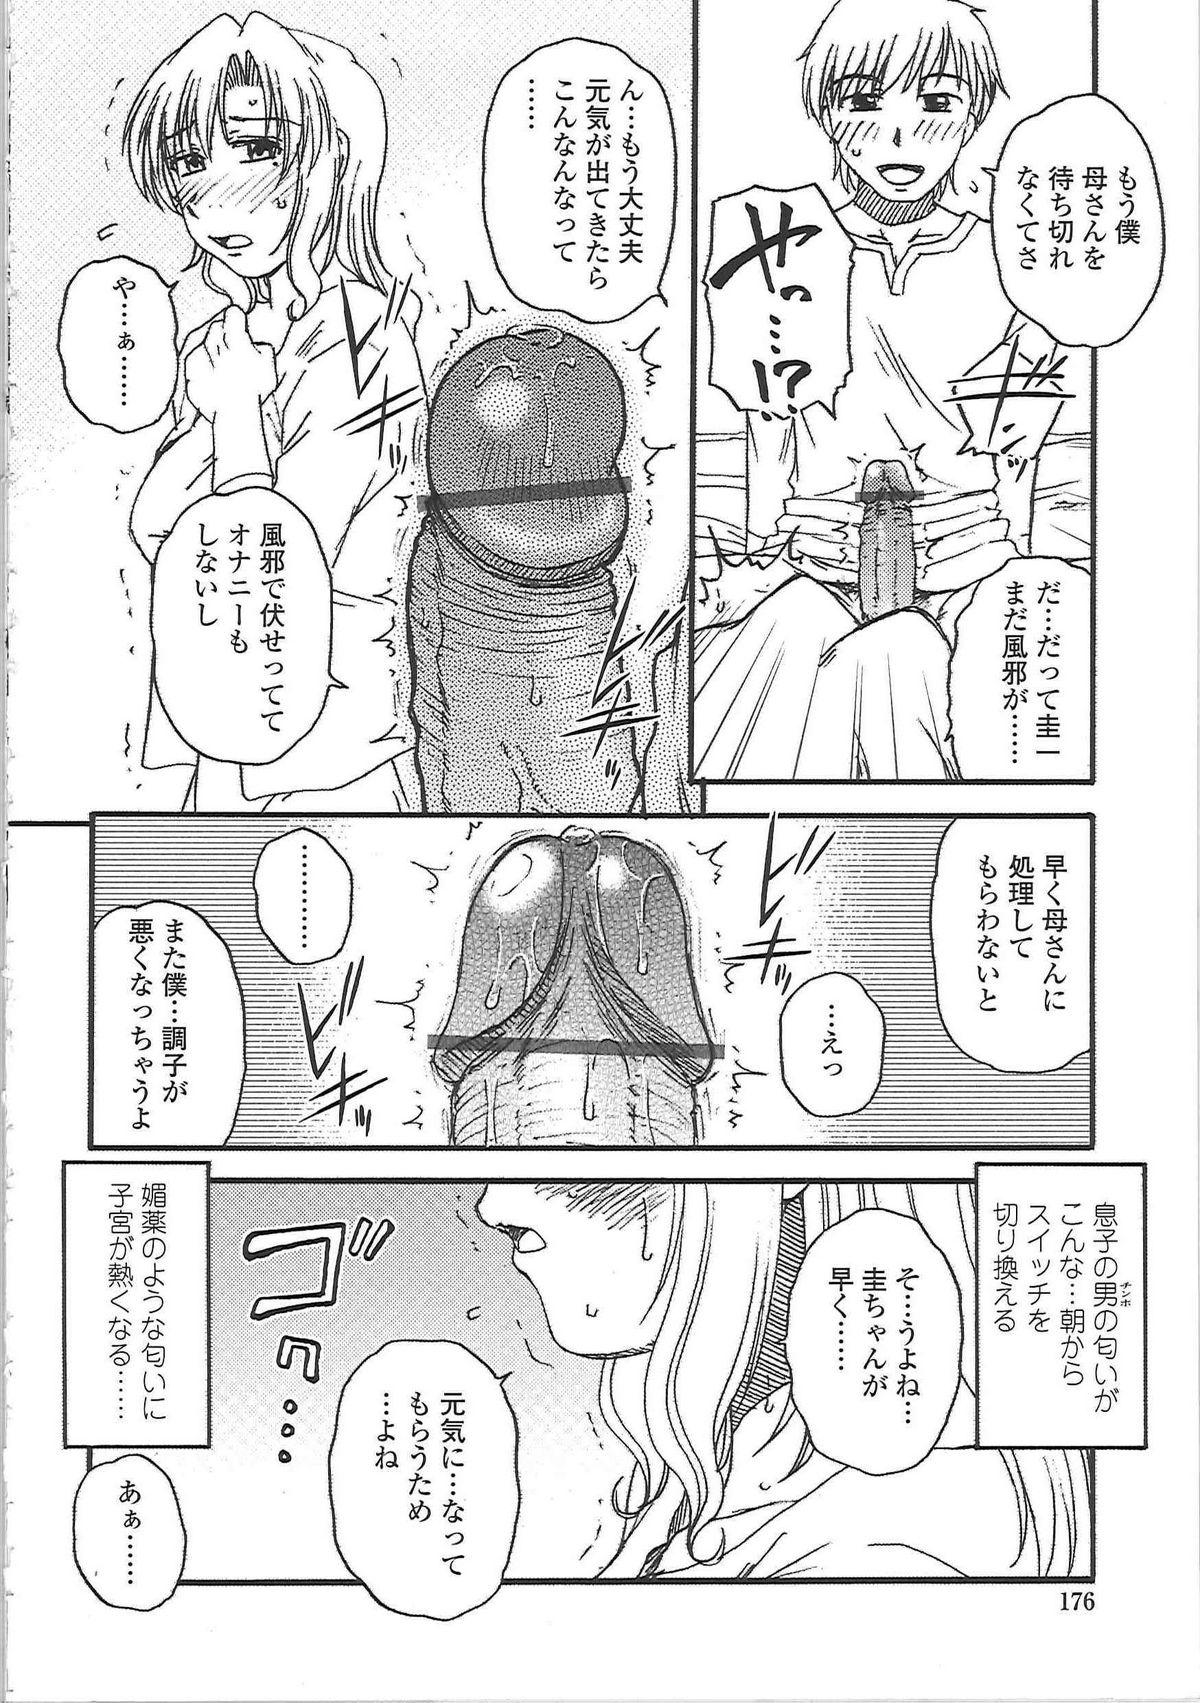 Nikuzuma Tsuushin - Erotic Wife Communication 180